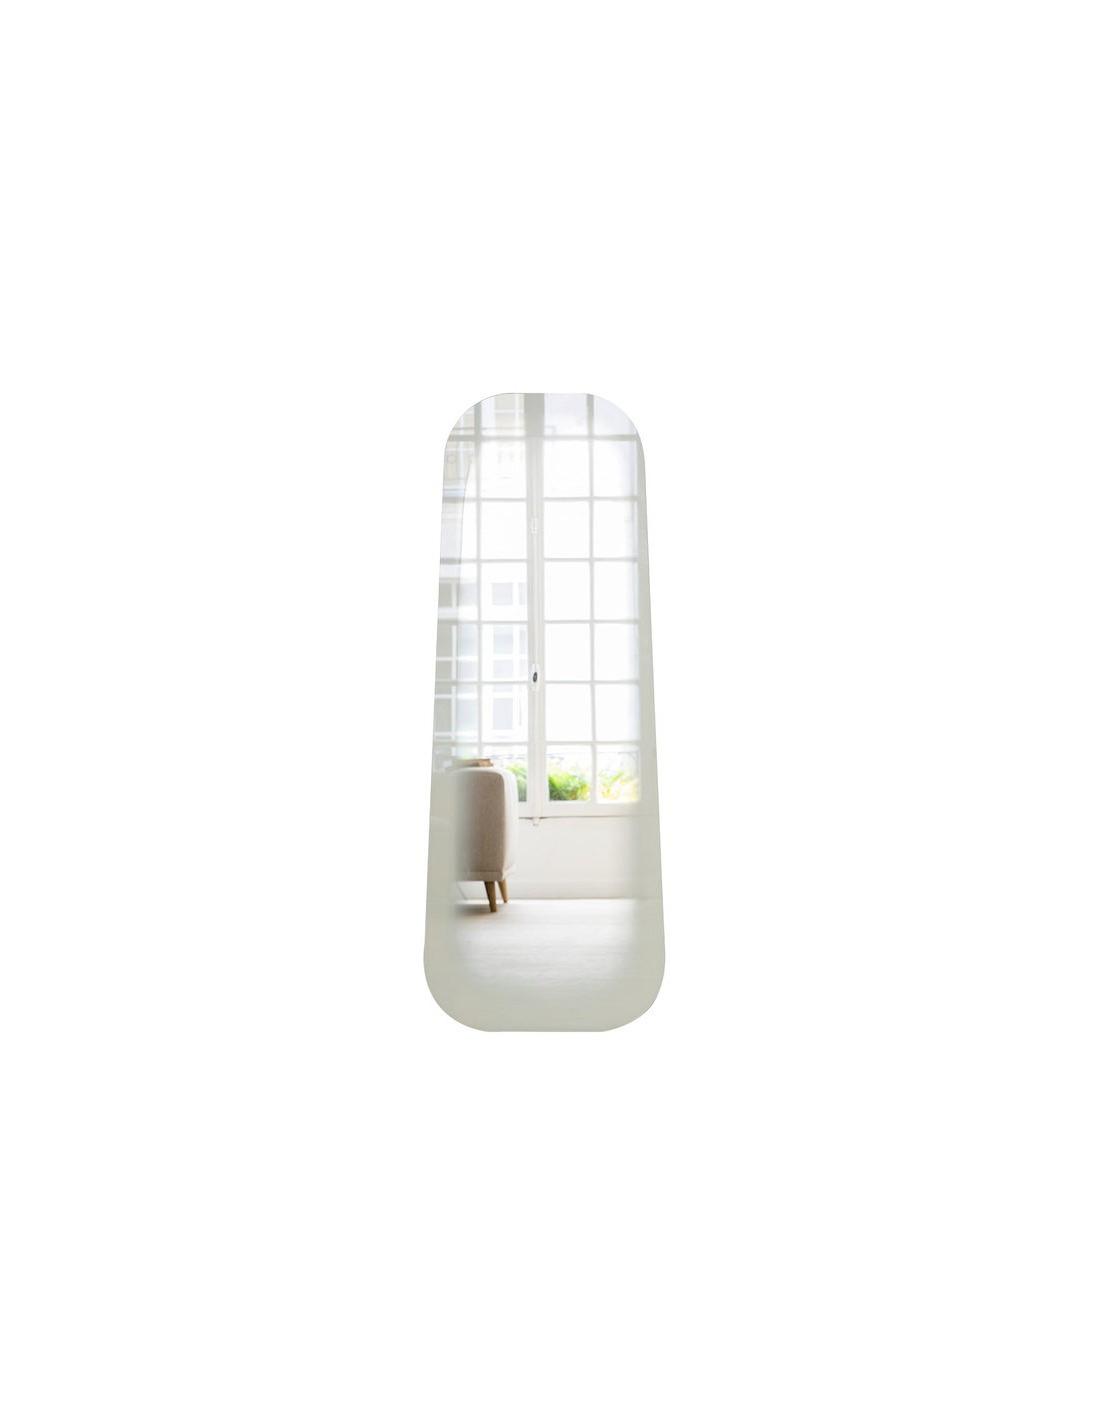 Miroir design fading blanc par thomas eurlings otoko for Miroir blanc design